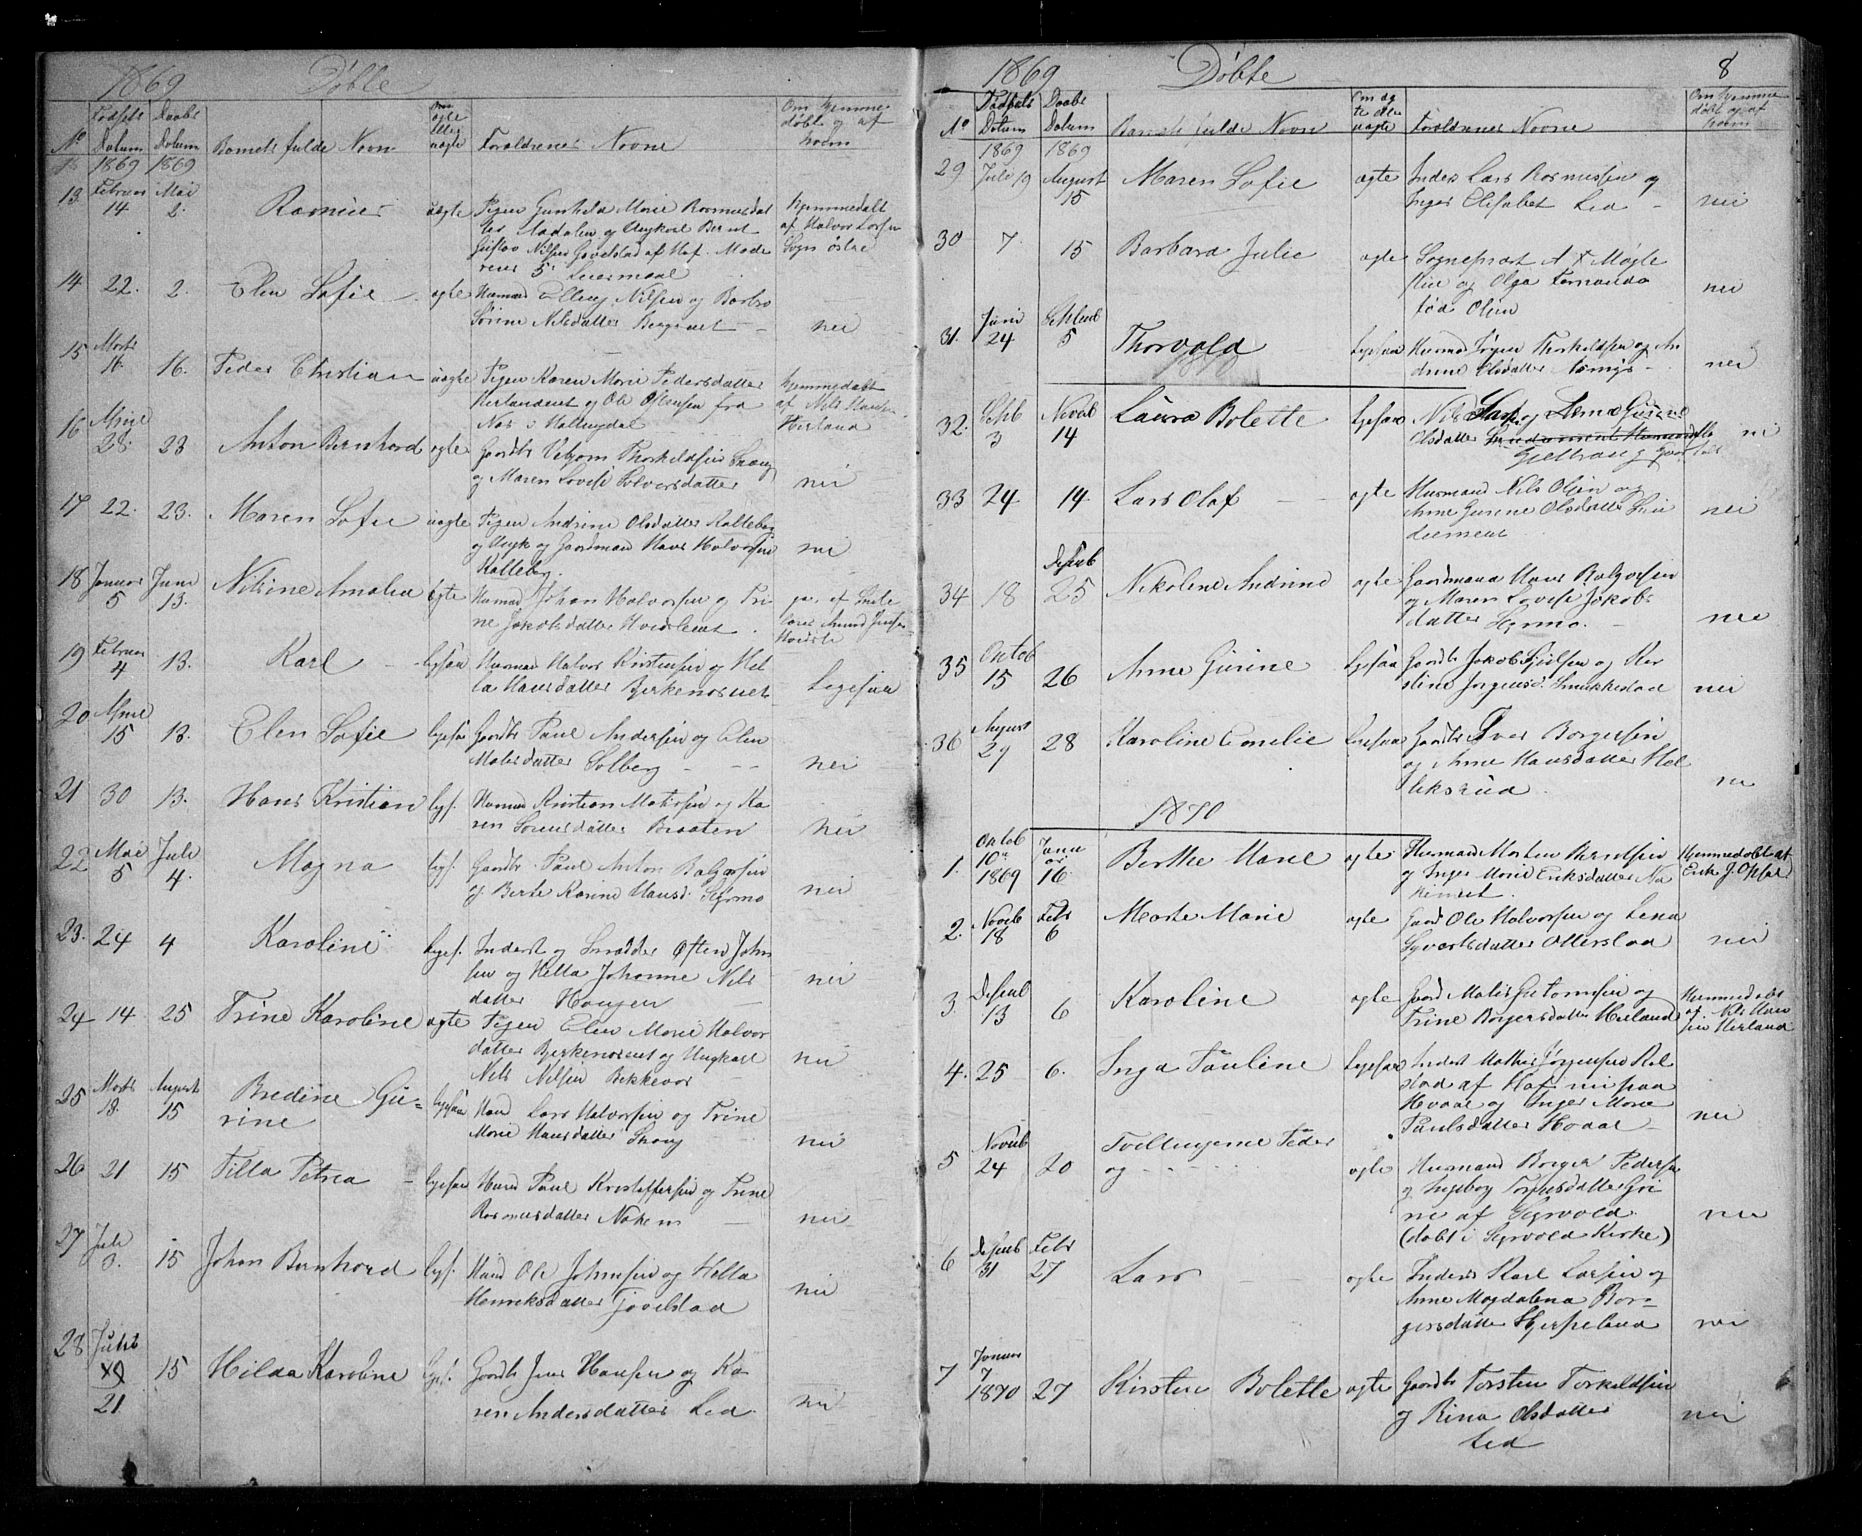 SAKO, Lardal kirkebøker, G/Ga/L0001: Klokkerbok nr. I 1, 1864-1901, s. 8